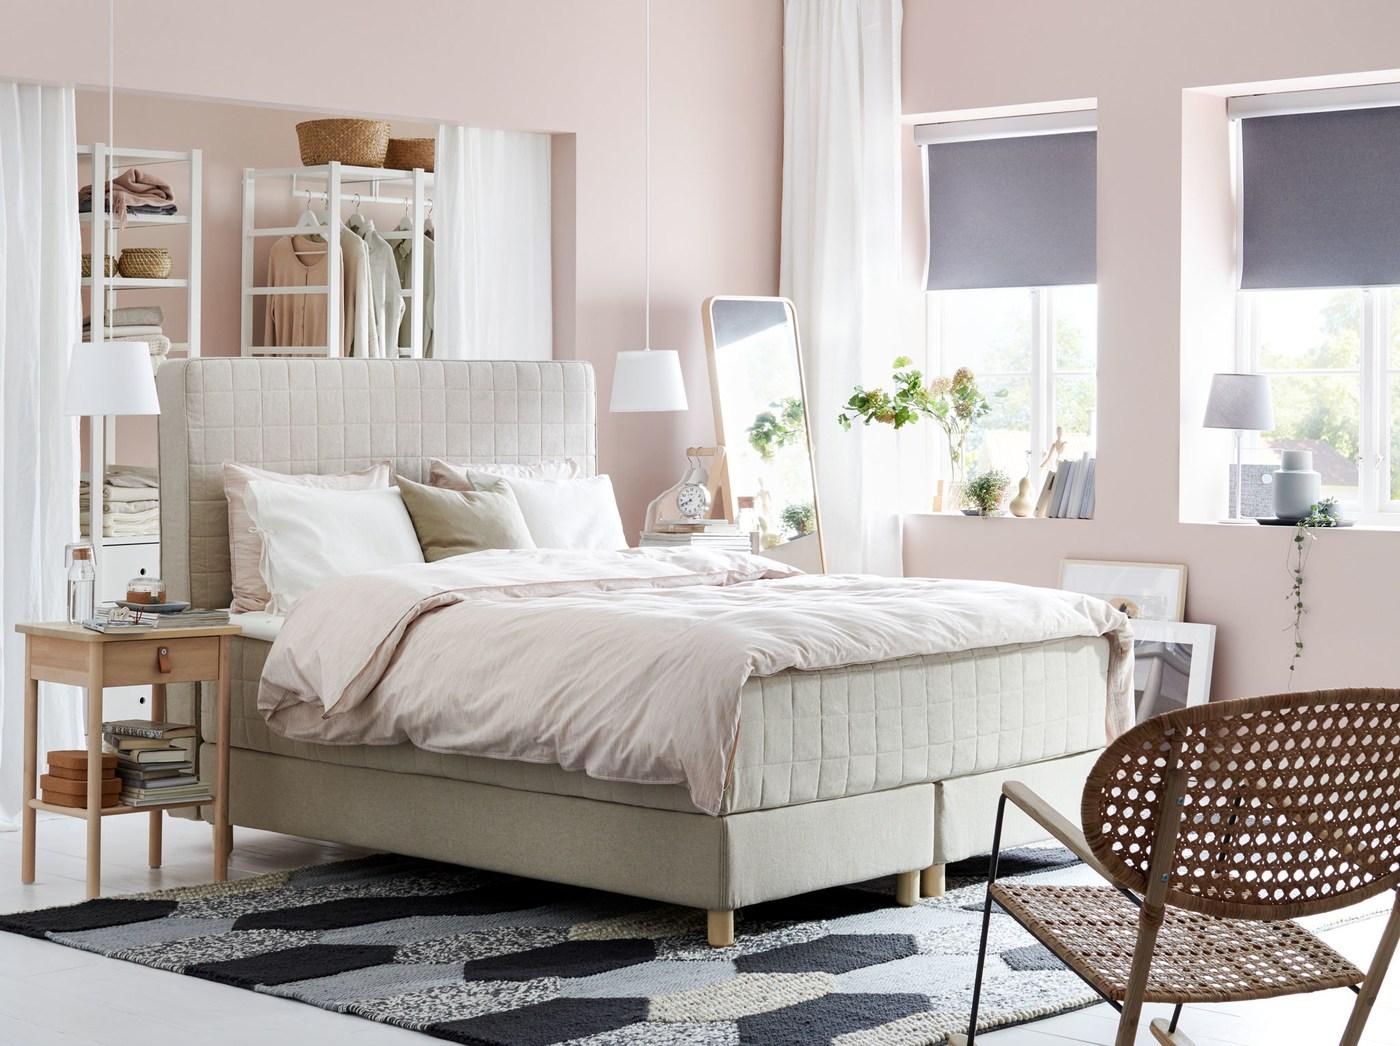 Attrayant Bedroom Furniture Inspiration Online | IKEA UAE   IKEA